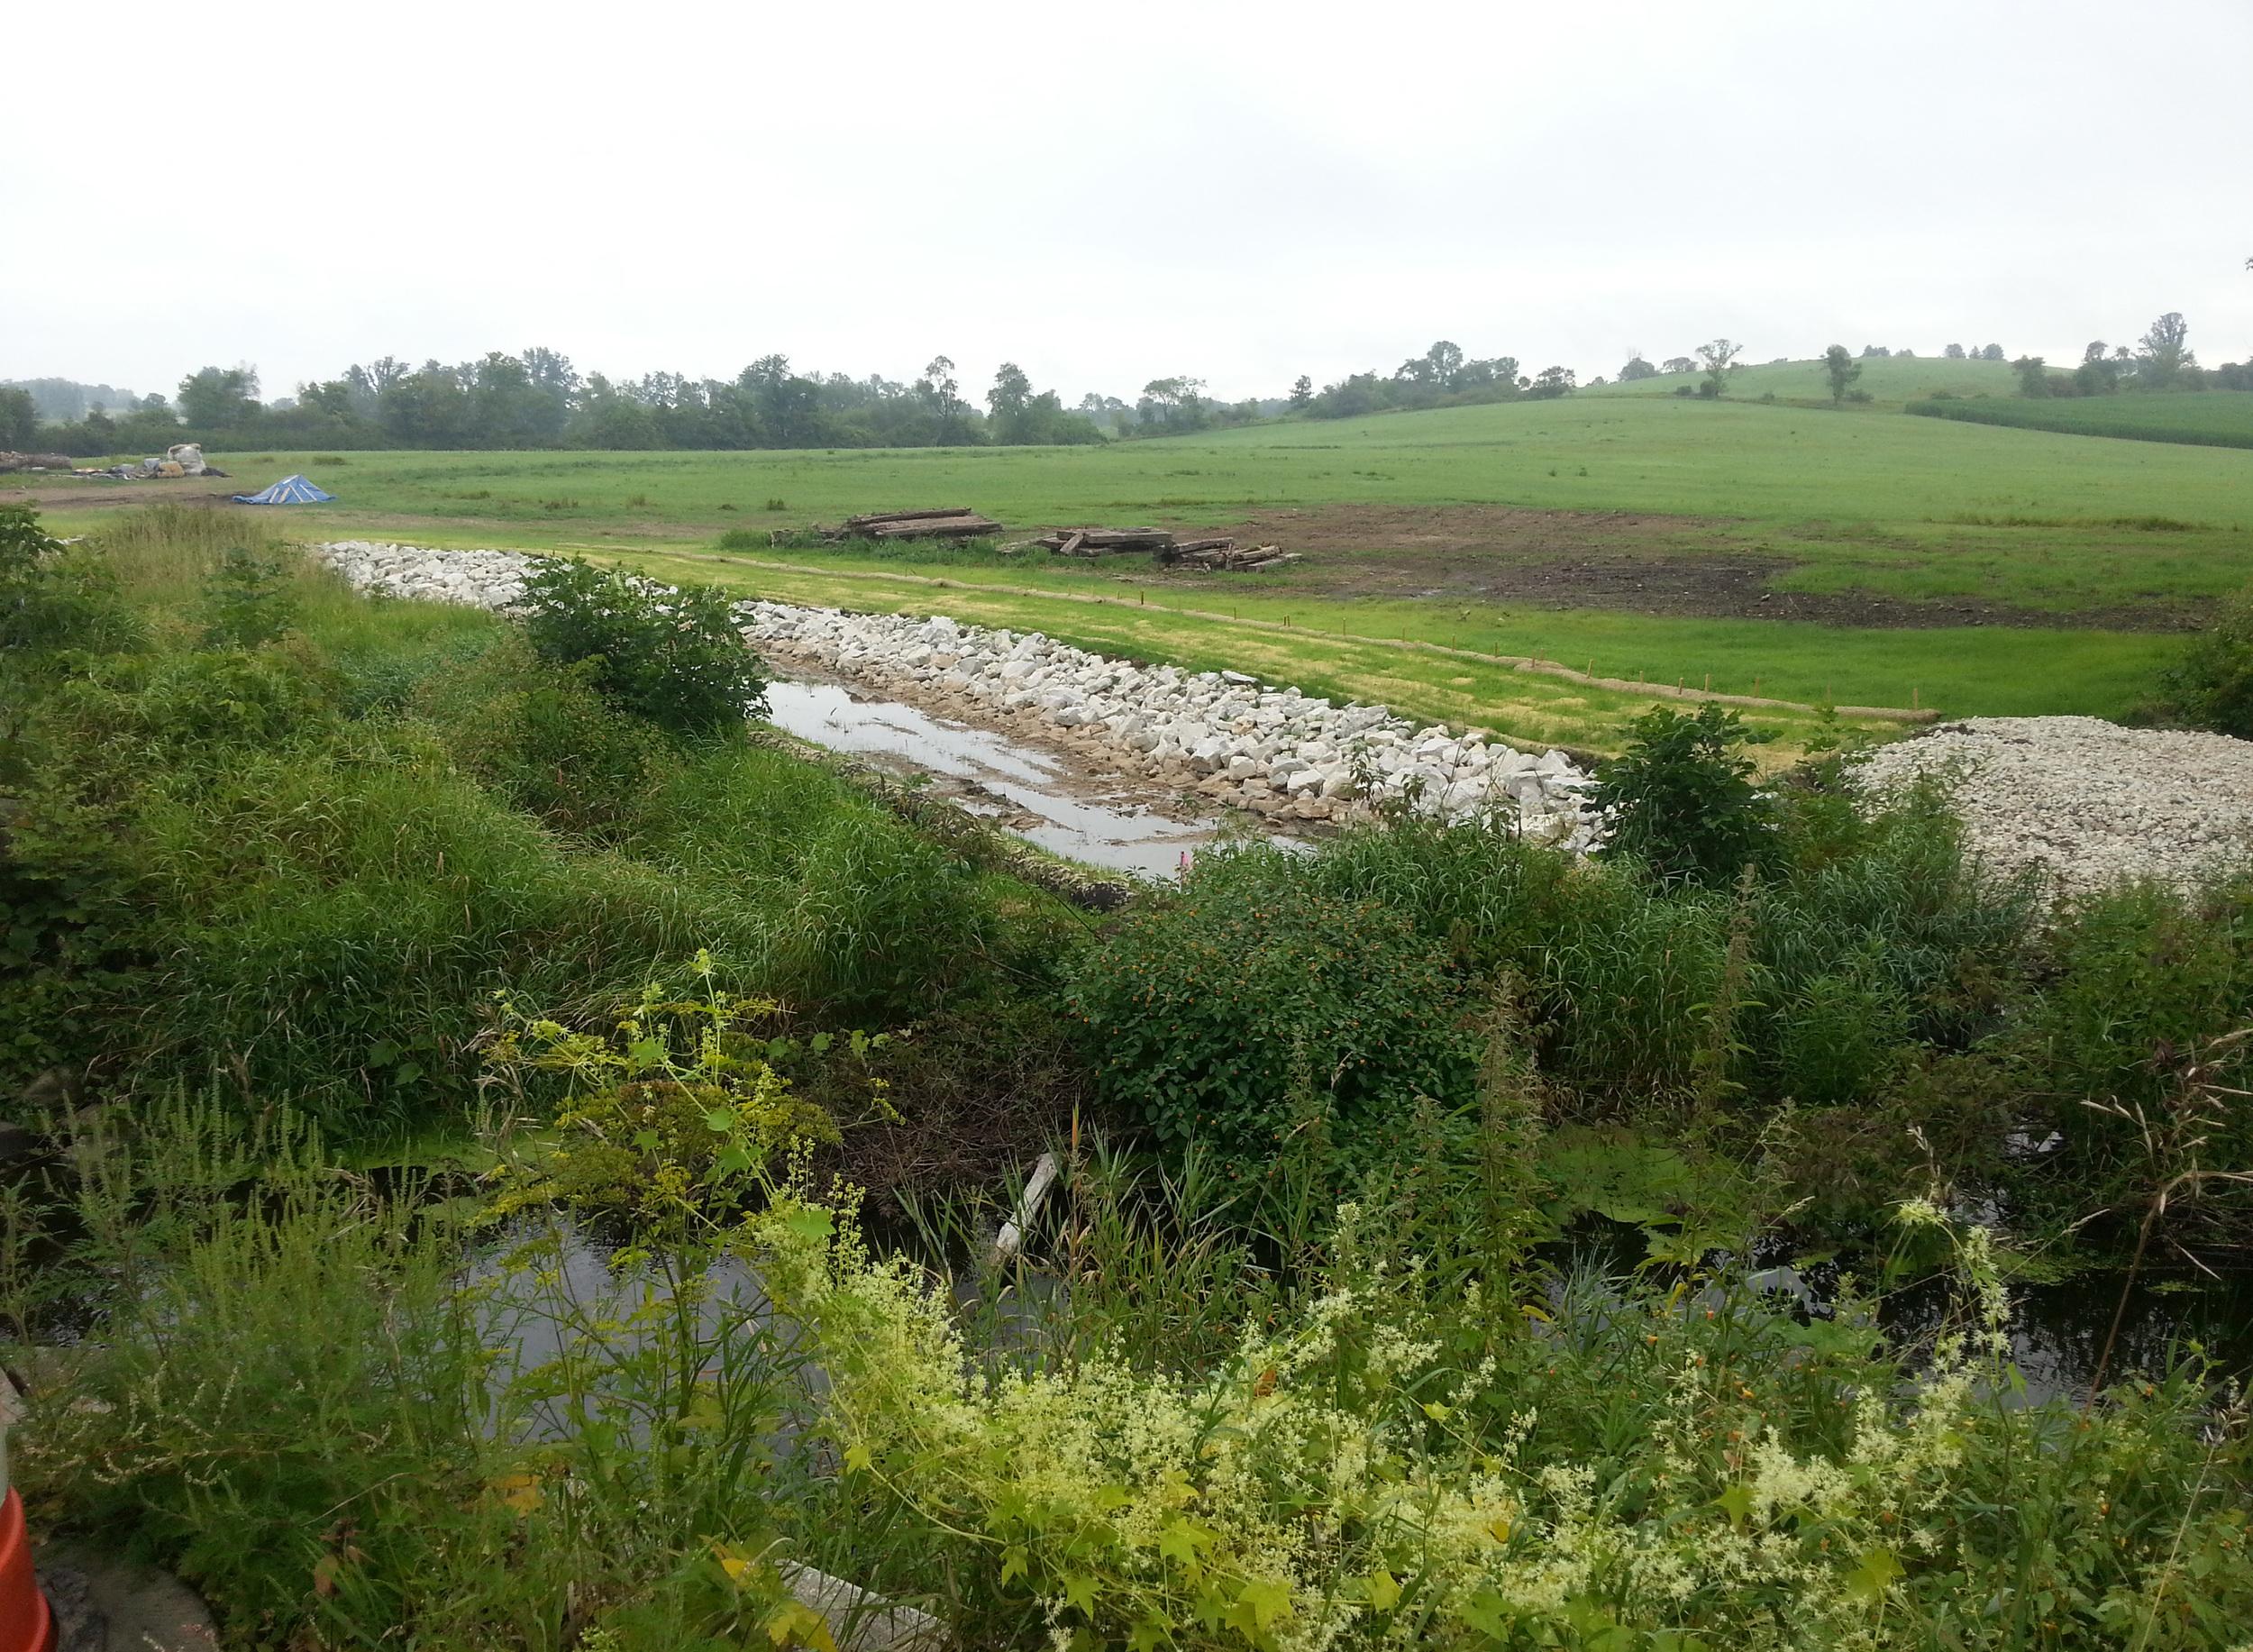 NR-creek-3.jpg